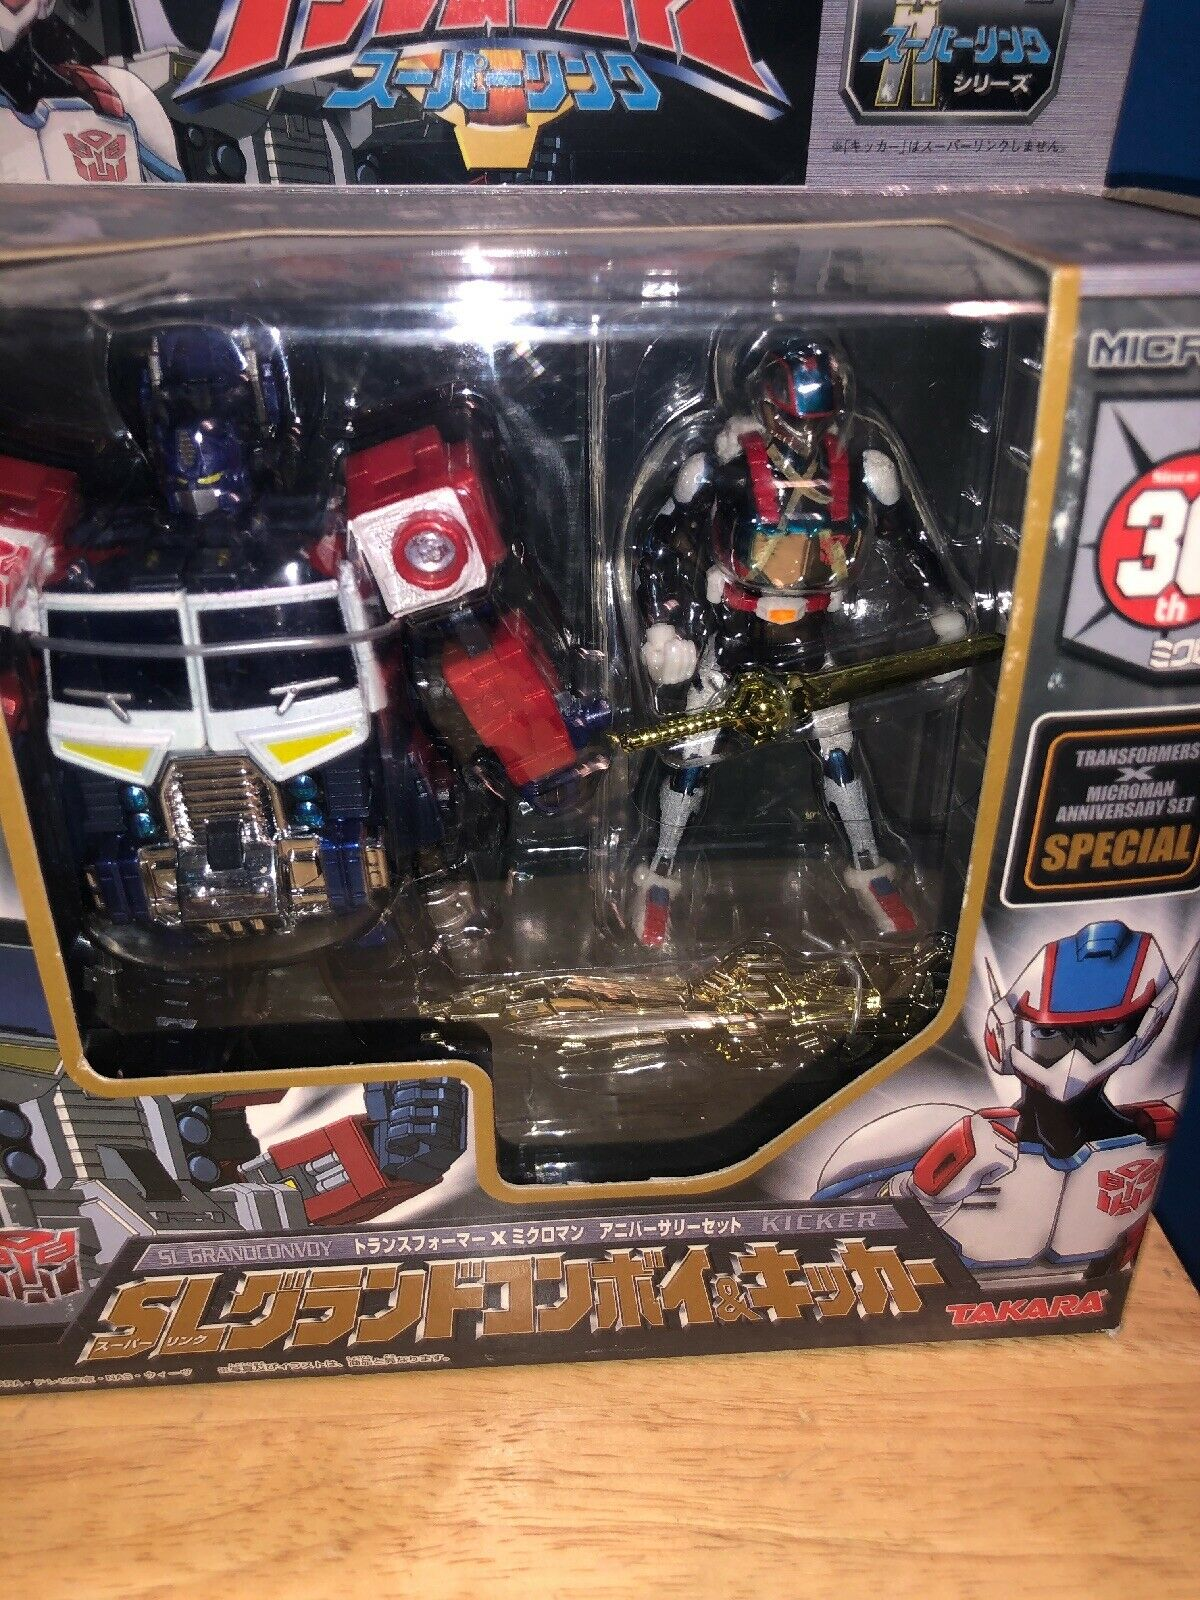 Transformers súperlink SL Grand Convoy & Kicker Microman Set